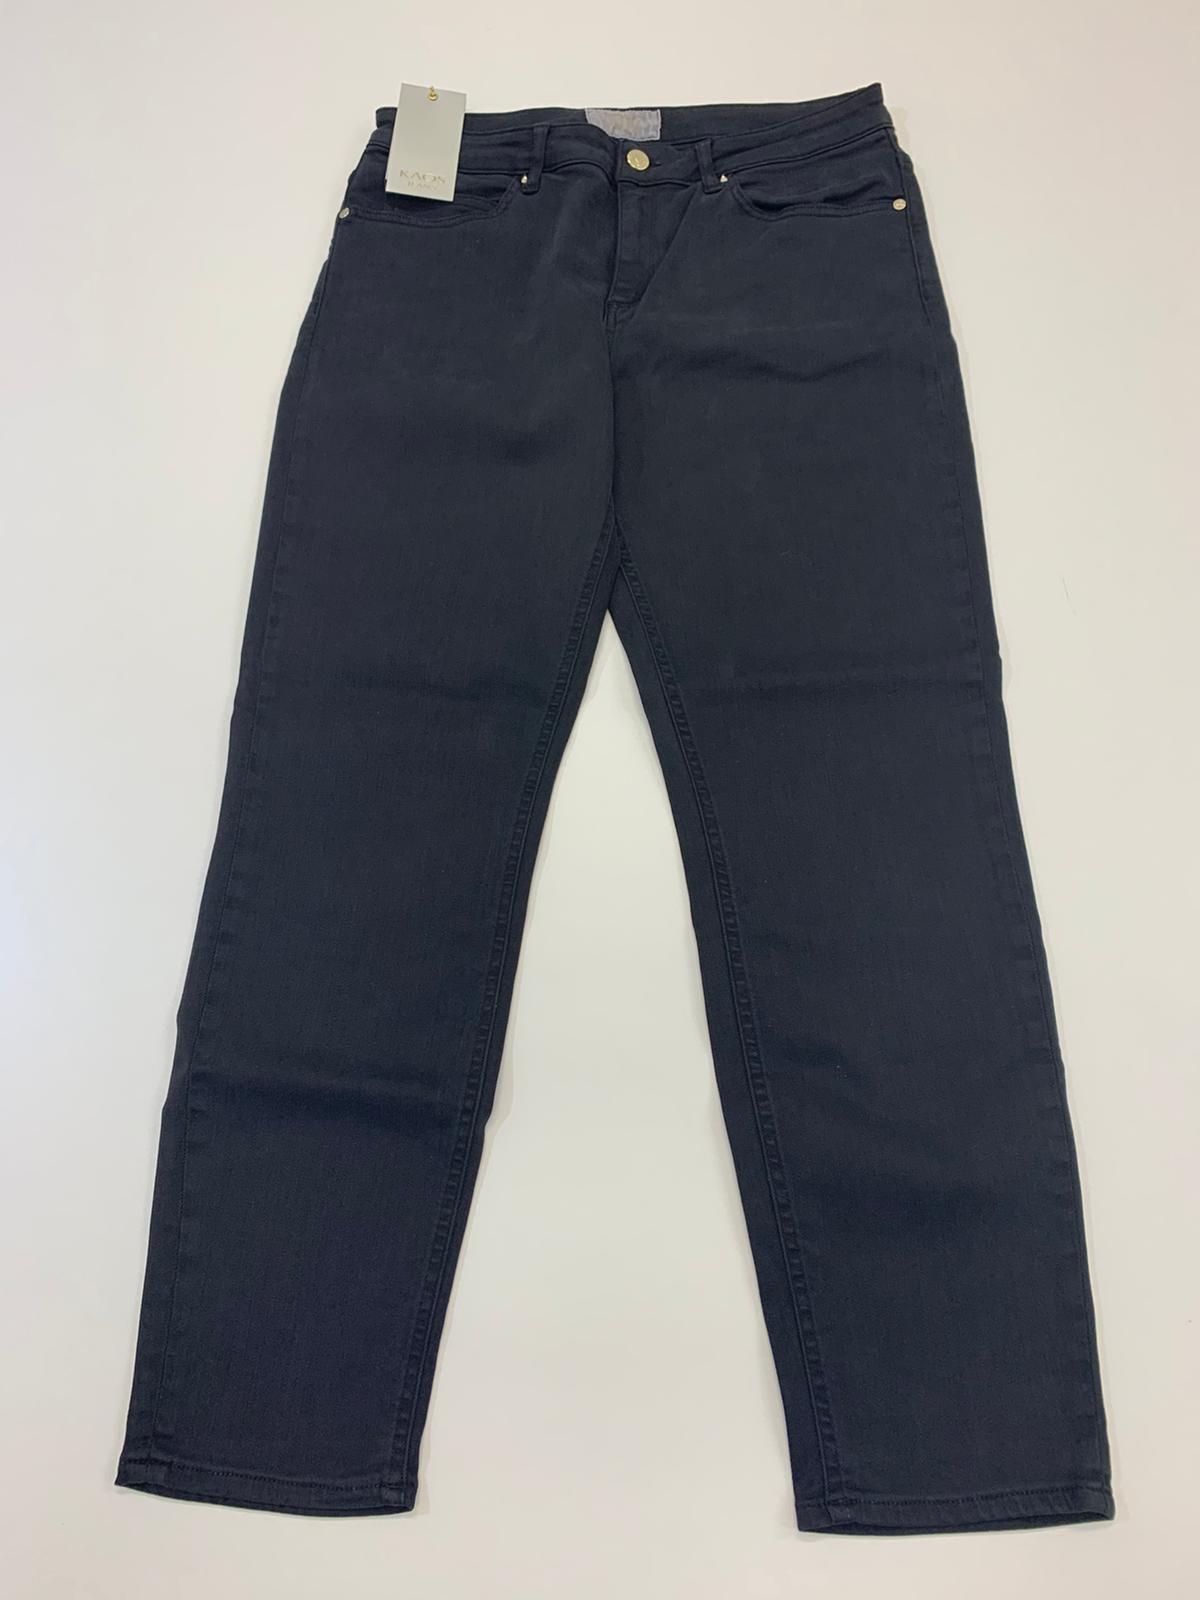 Pantalone Kaos Roger Nero